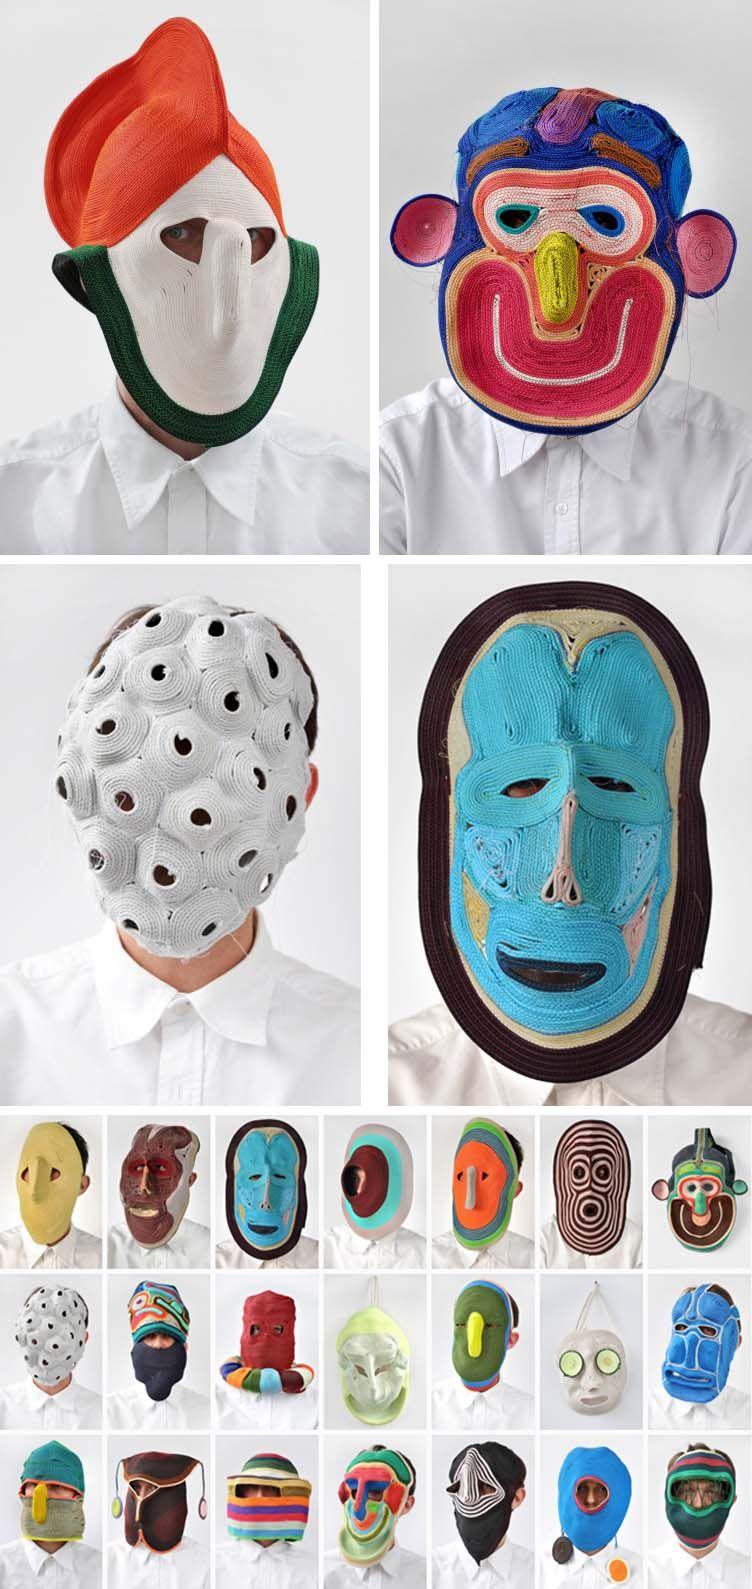 Bertjan Pot's masks